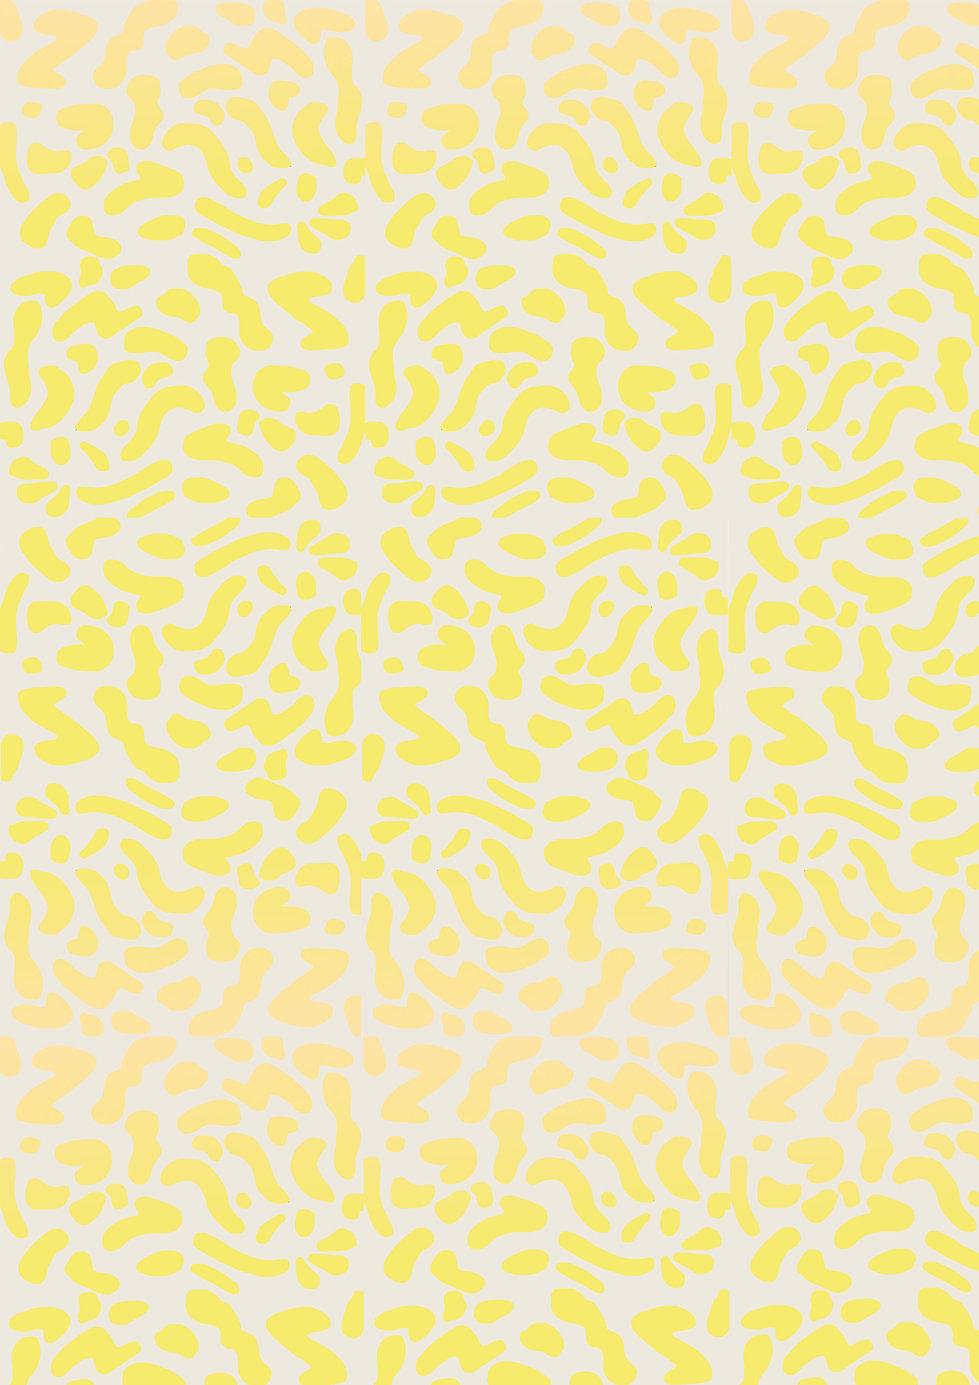 Yellowpattern.jpg